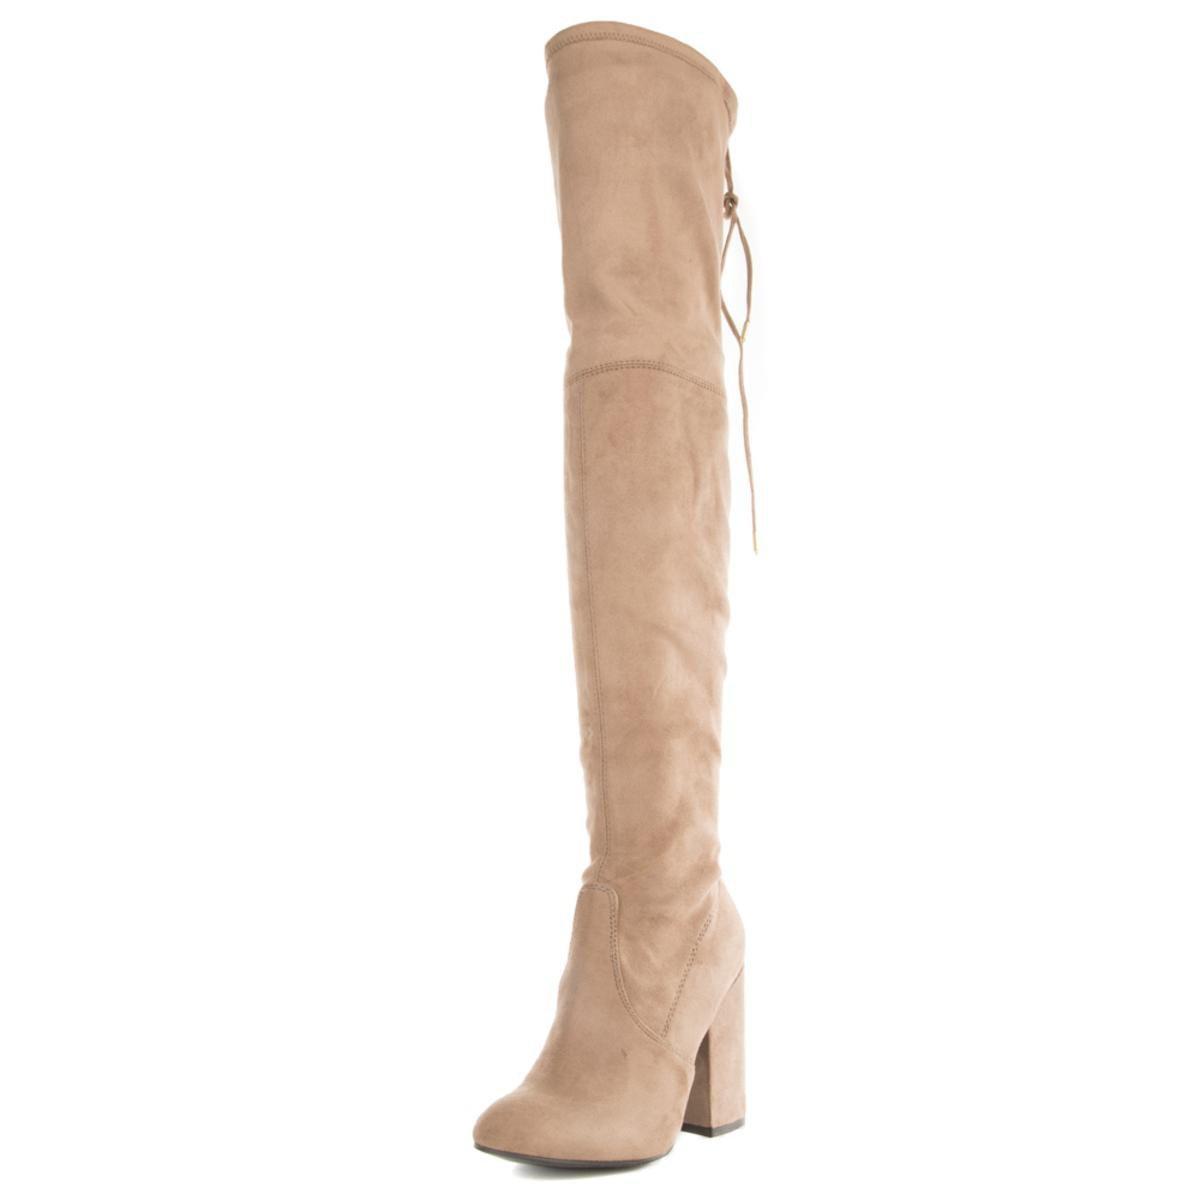 363c76d060e4 Steve Madden - Brown Norri Taupe Thigh High Heeled Boots - Lyst. View  fullscreen